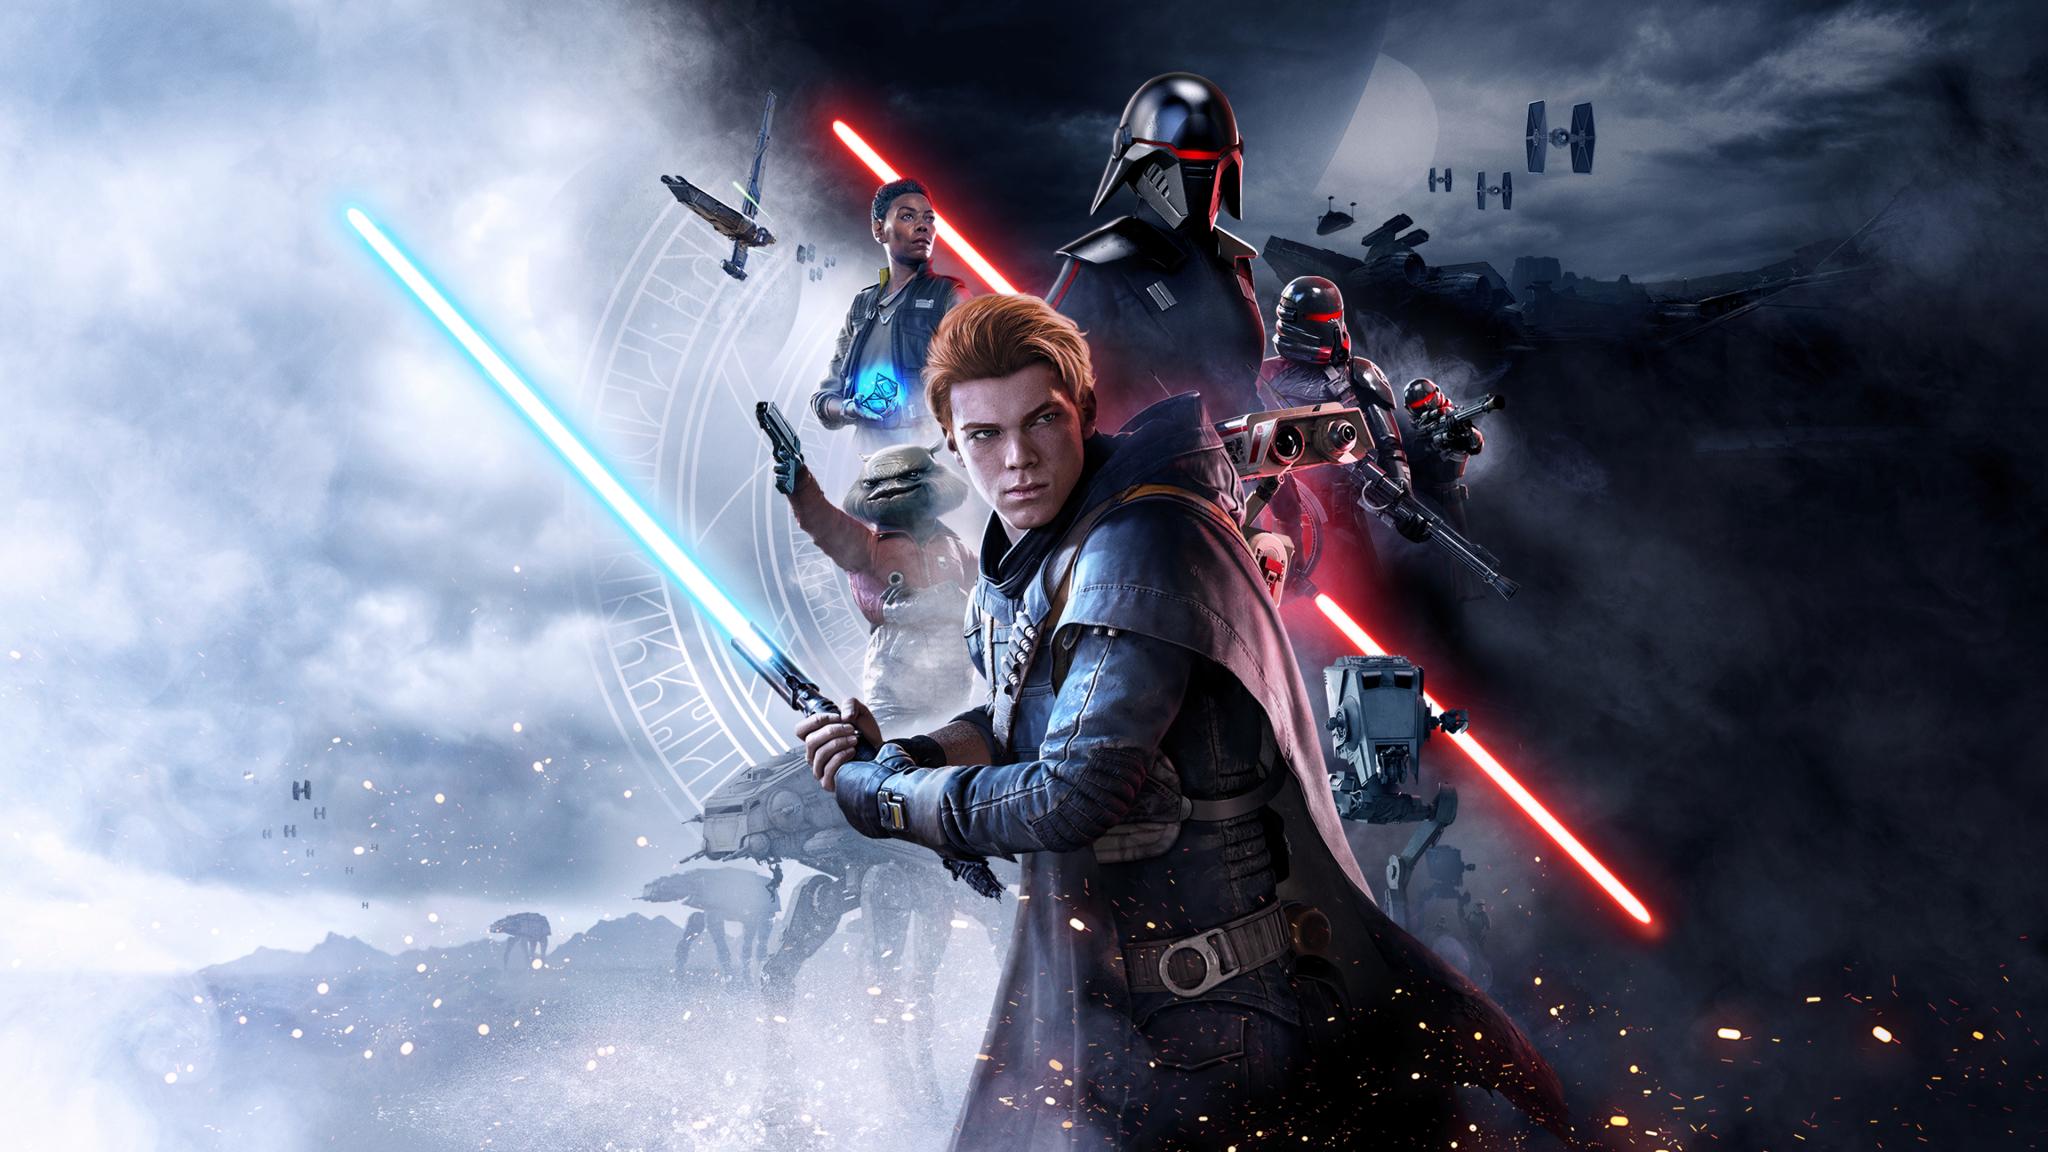 2048x1152 Star Wars Jedi Fallen Order Poster 2019 ...